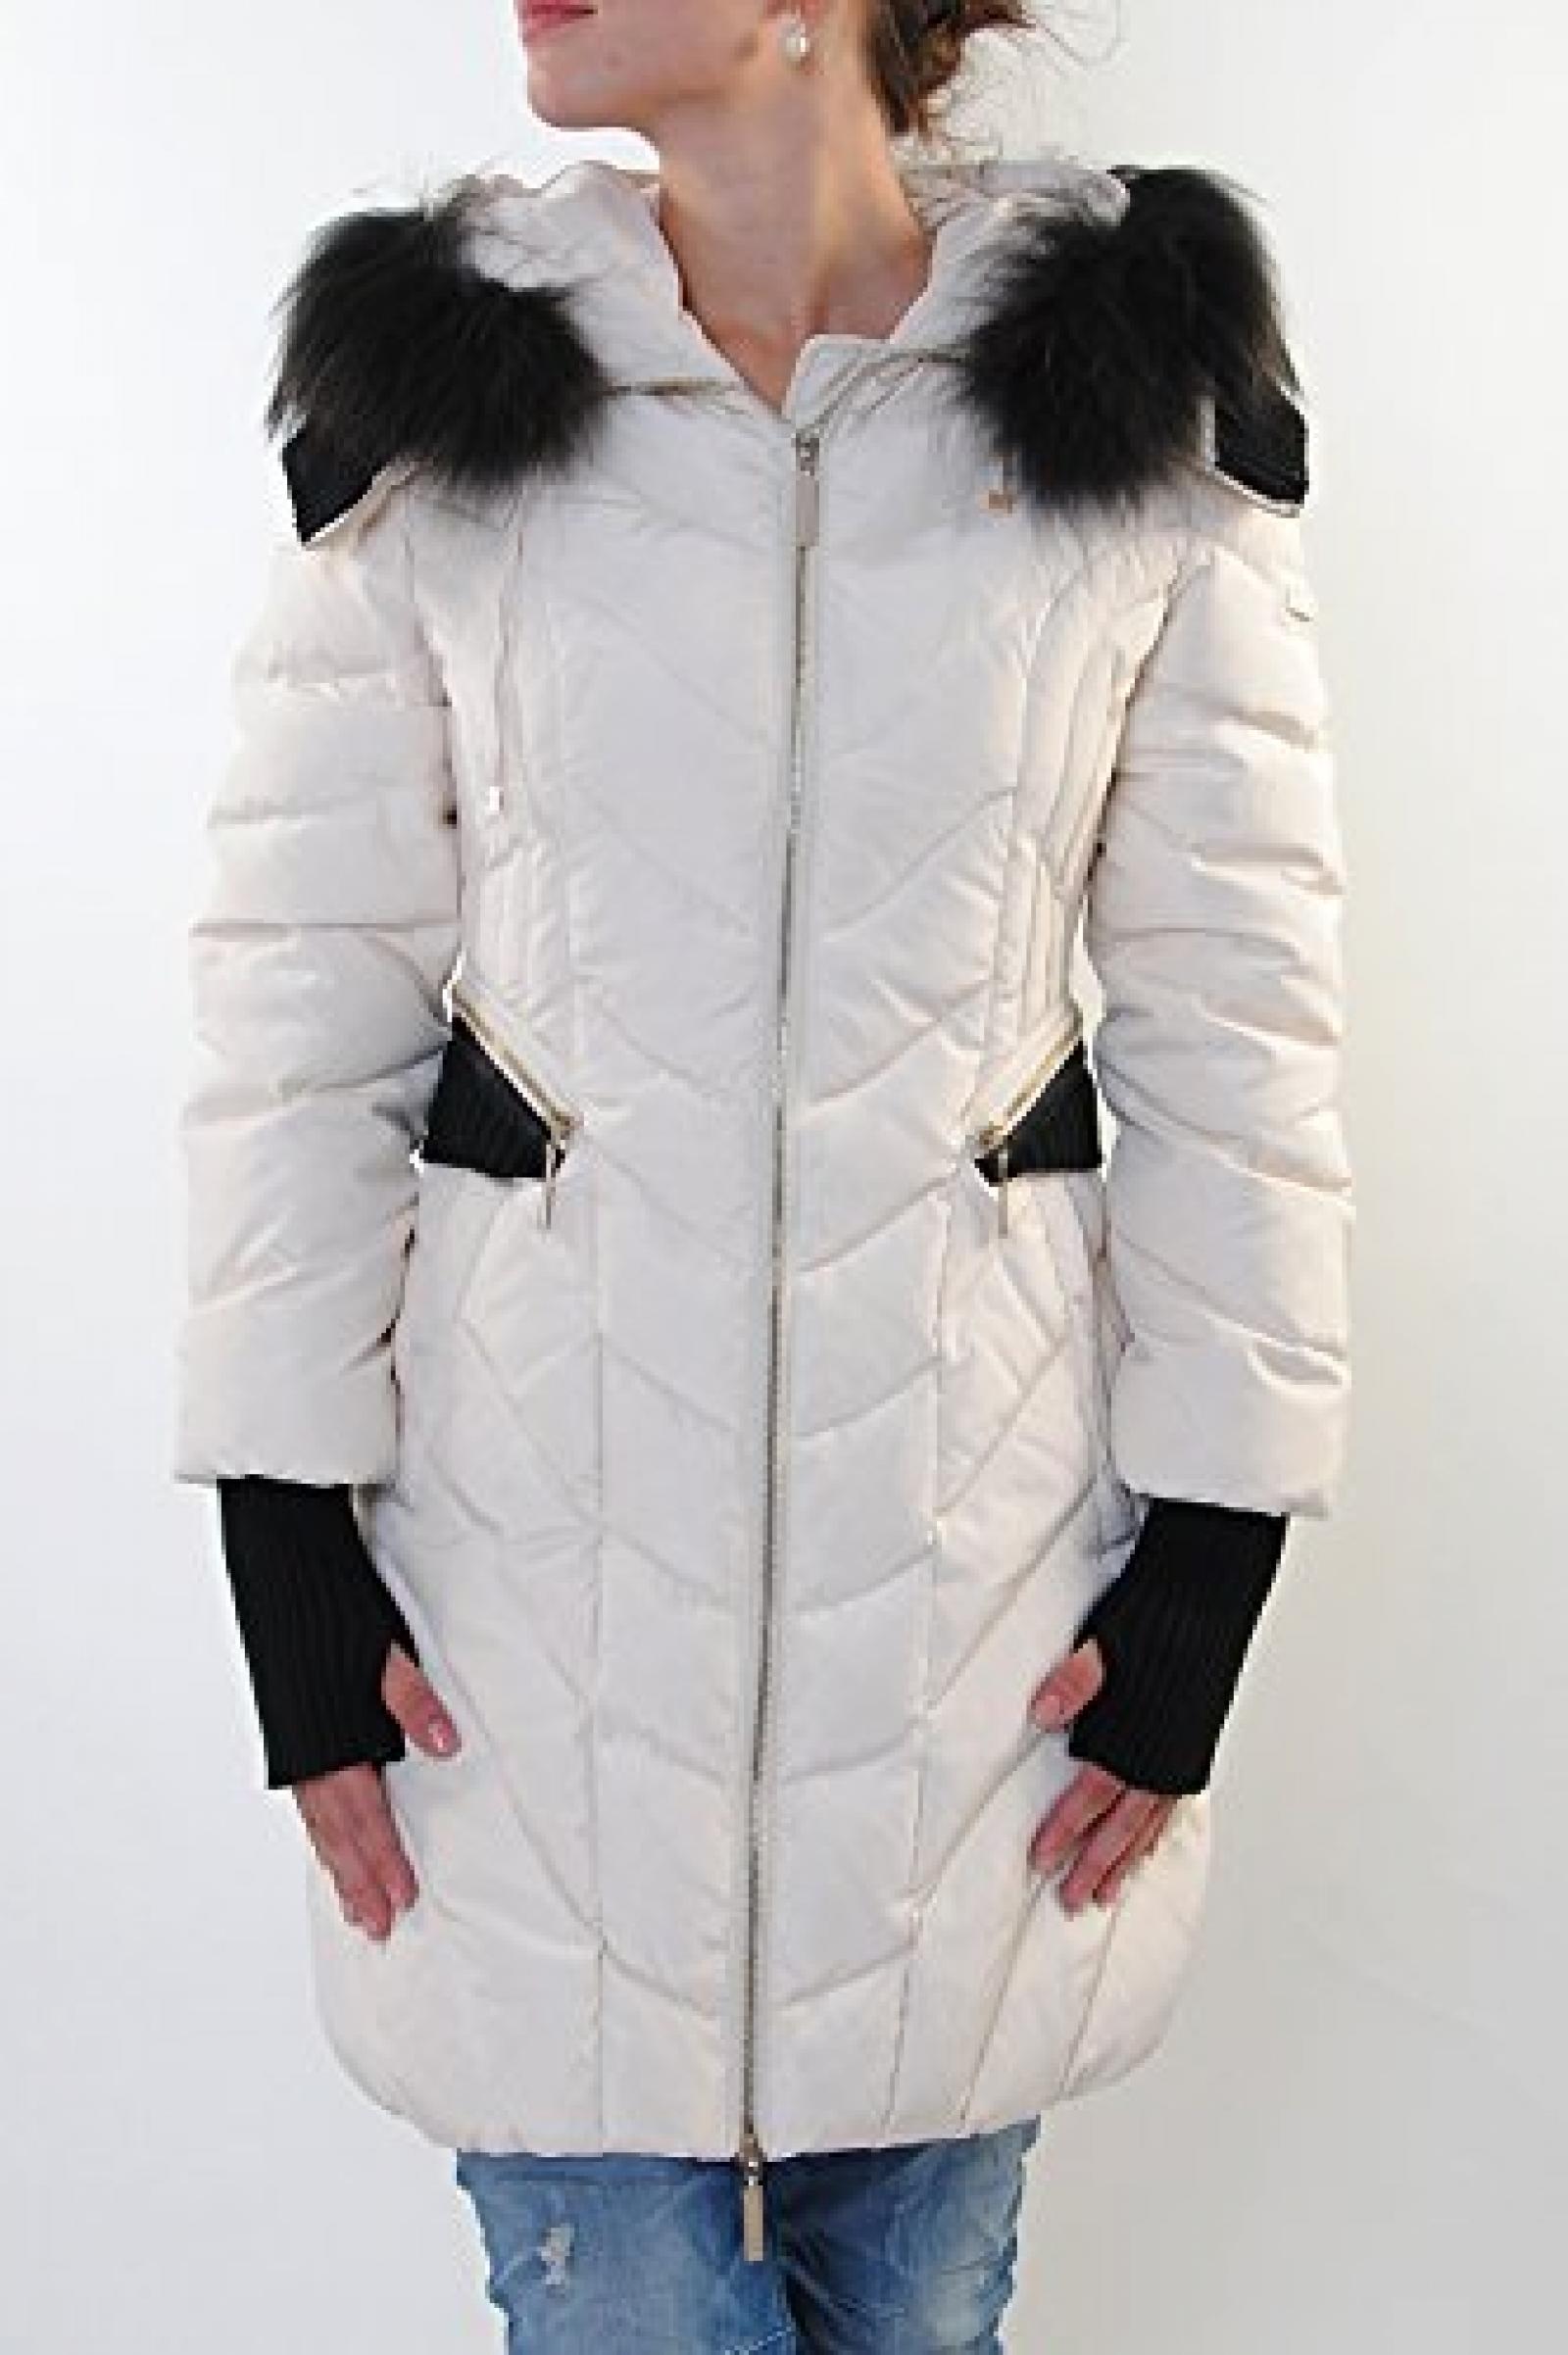 Relish Piumino BUYT Damen Winterjacke, Steppjack, Daunenjacke, Parka